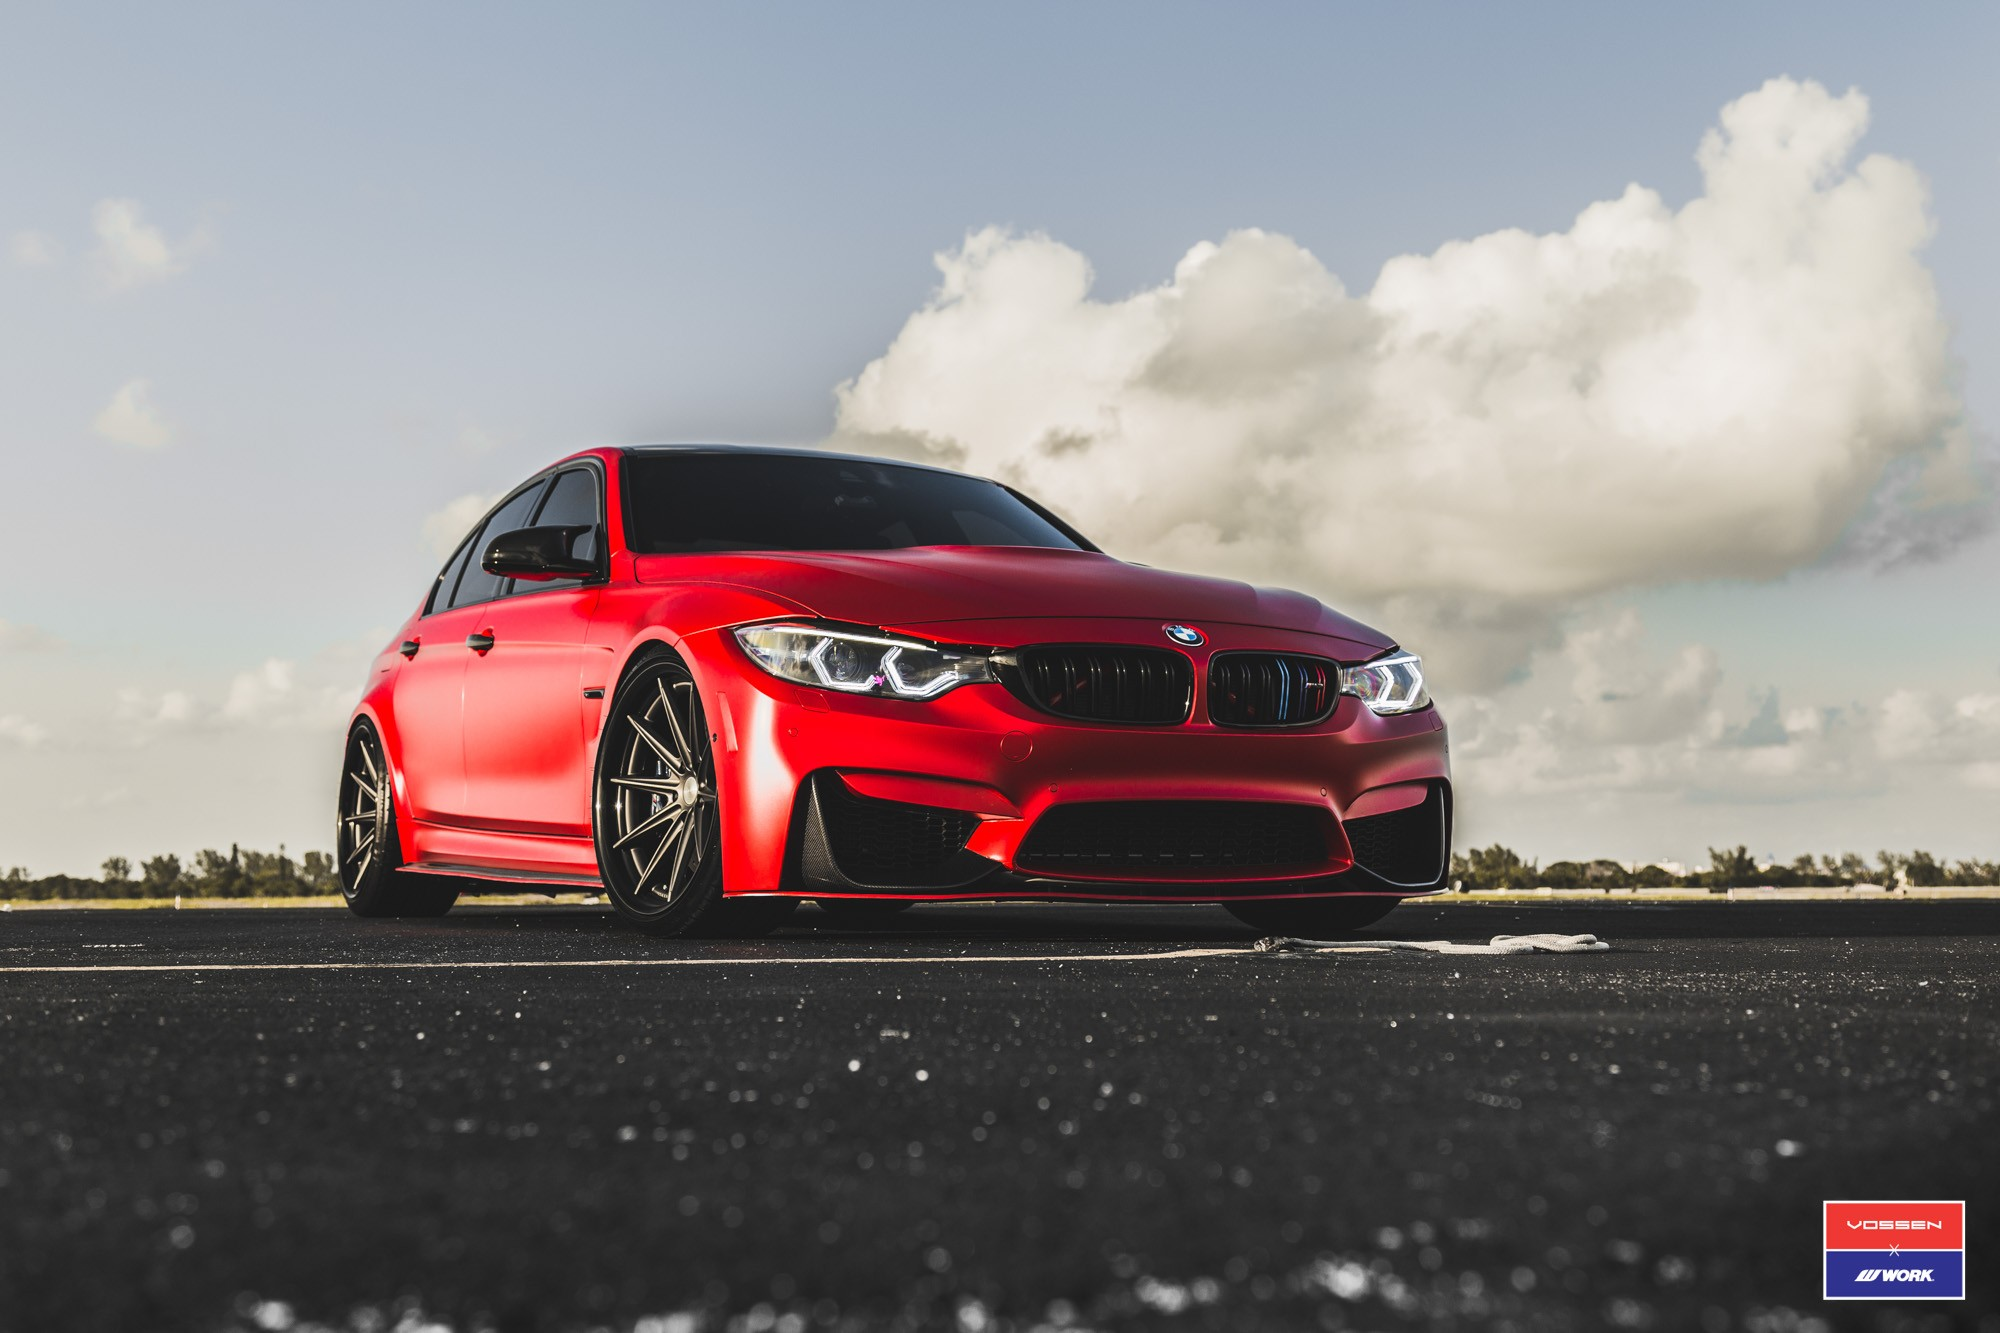 2017 BMW M3 Facelift in Red Gets Custom Vossen Wheels ...